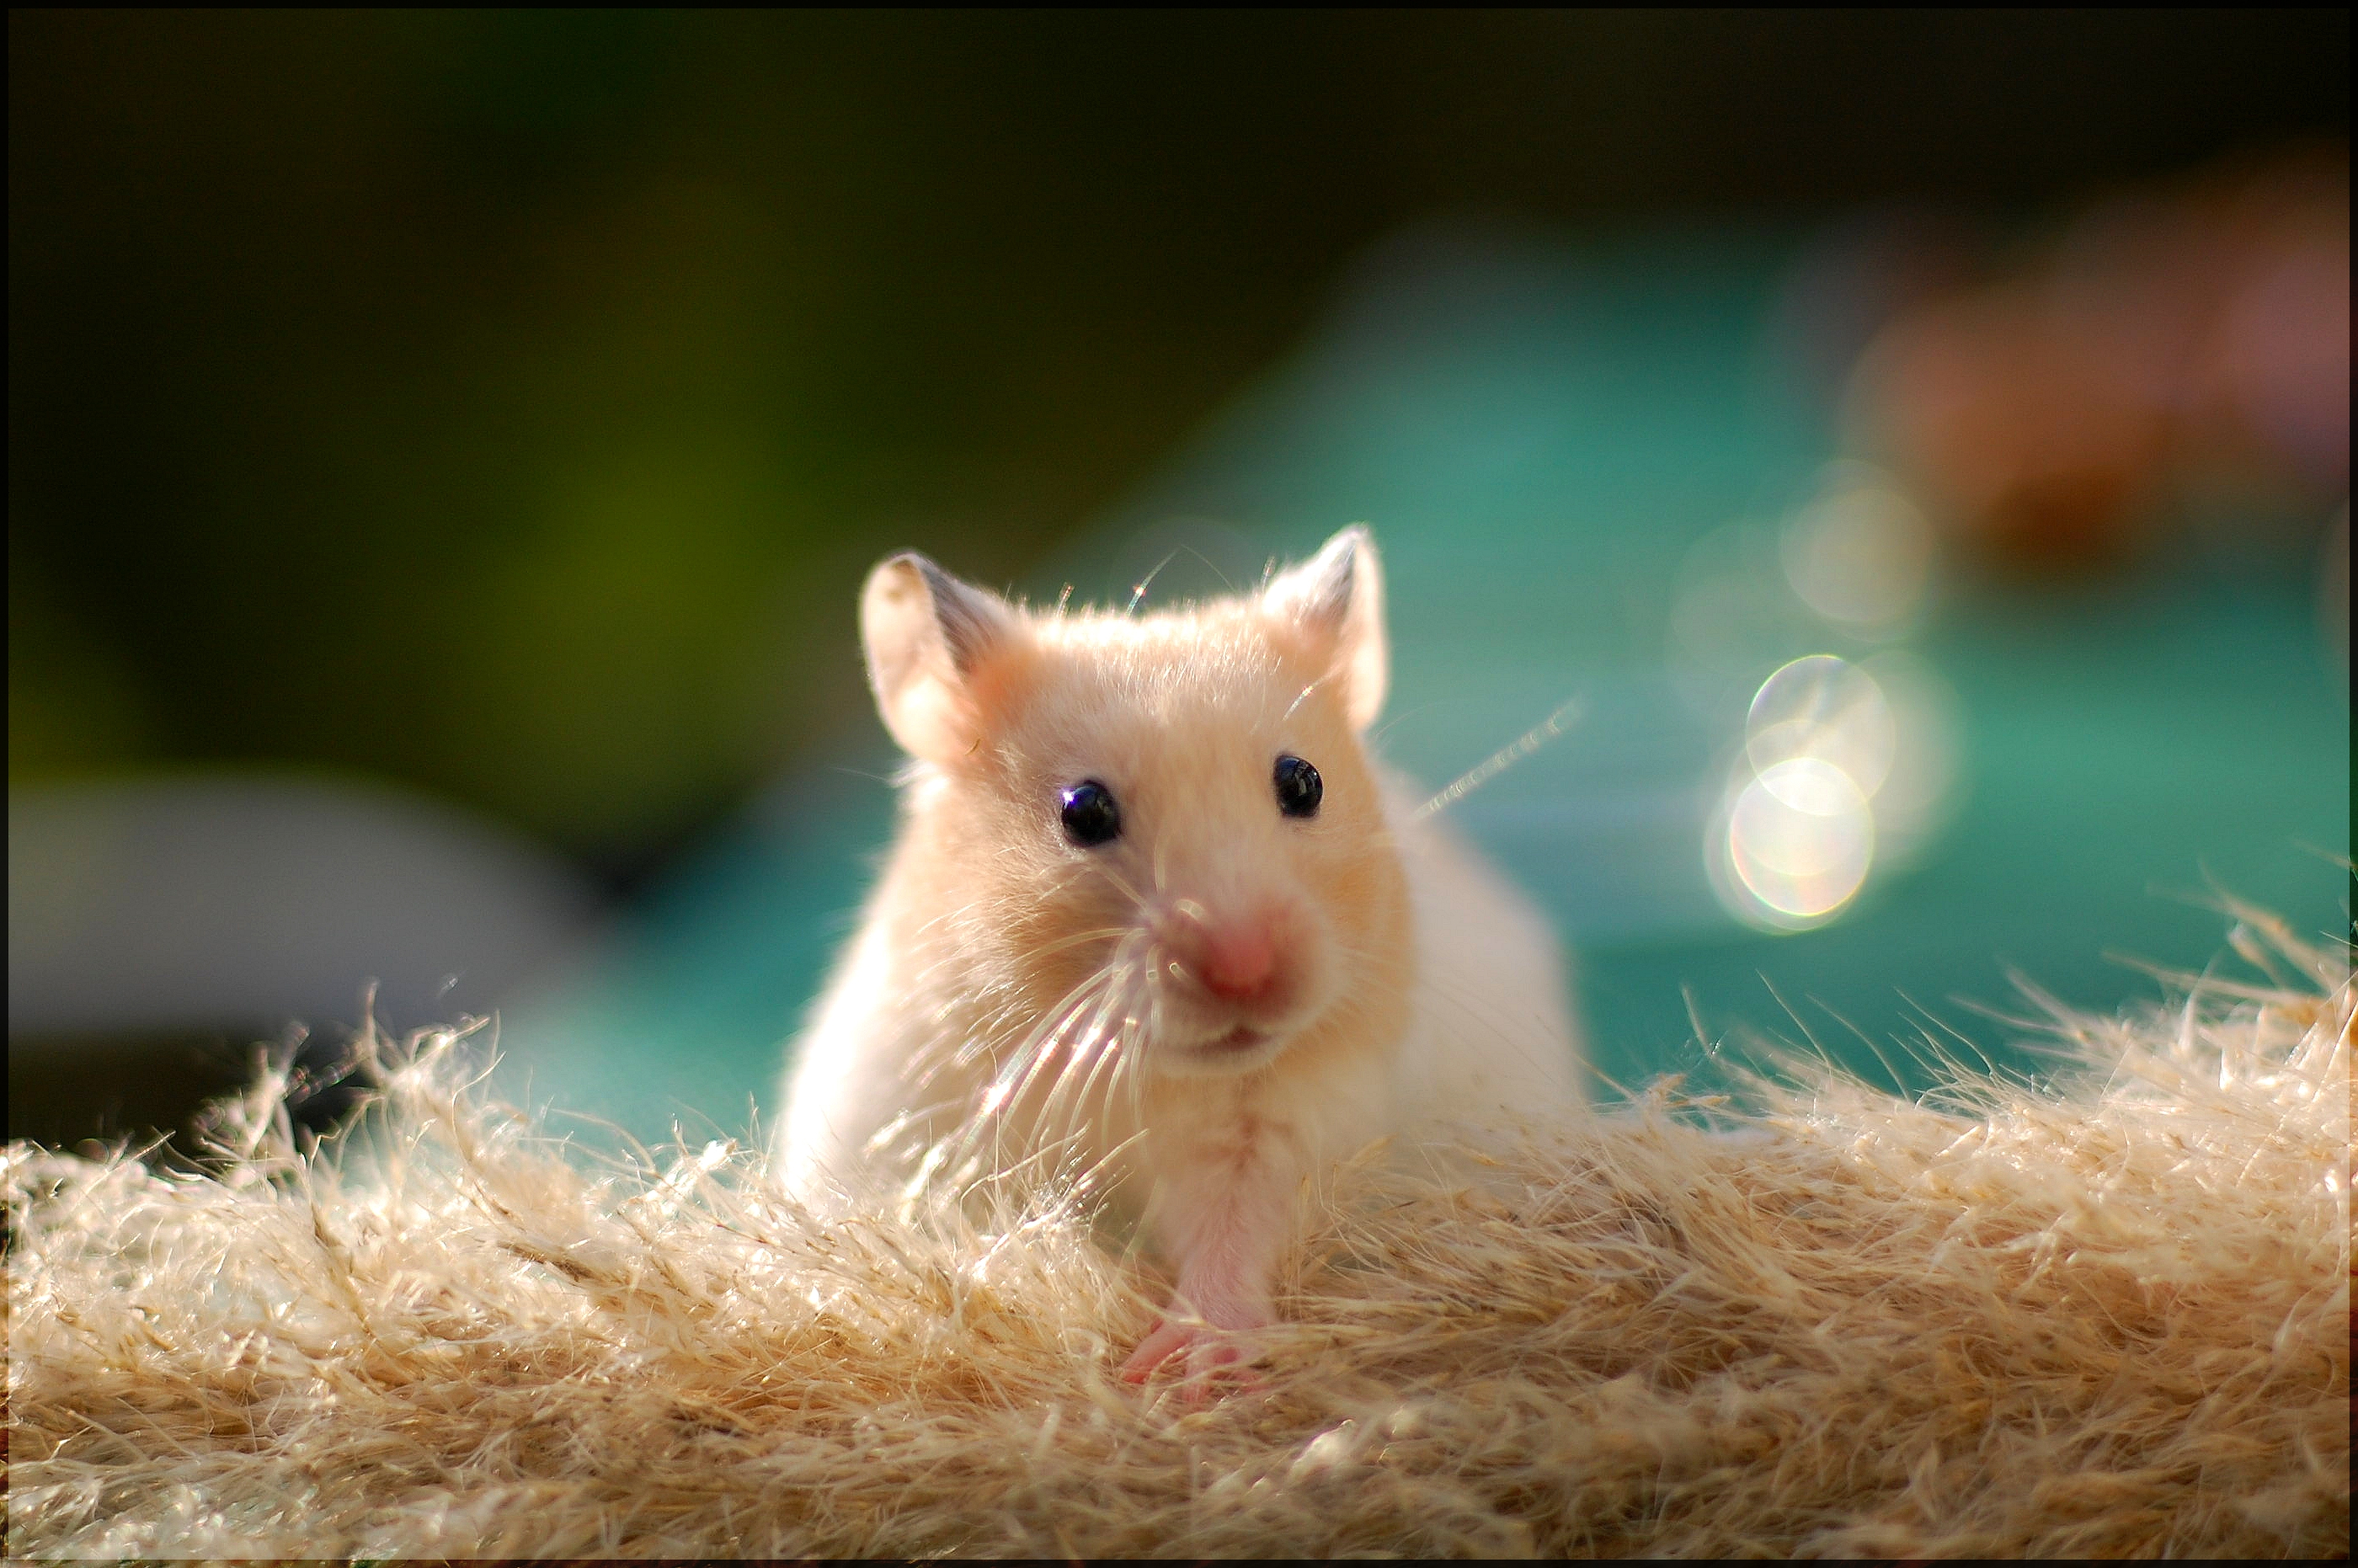 Cute Golden Hamster   Wallpaper Pin it 2800x1862